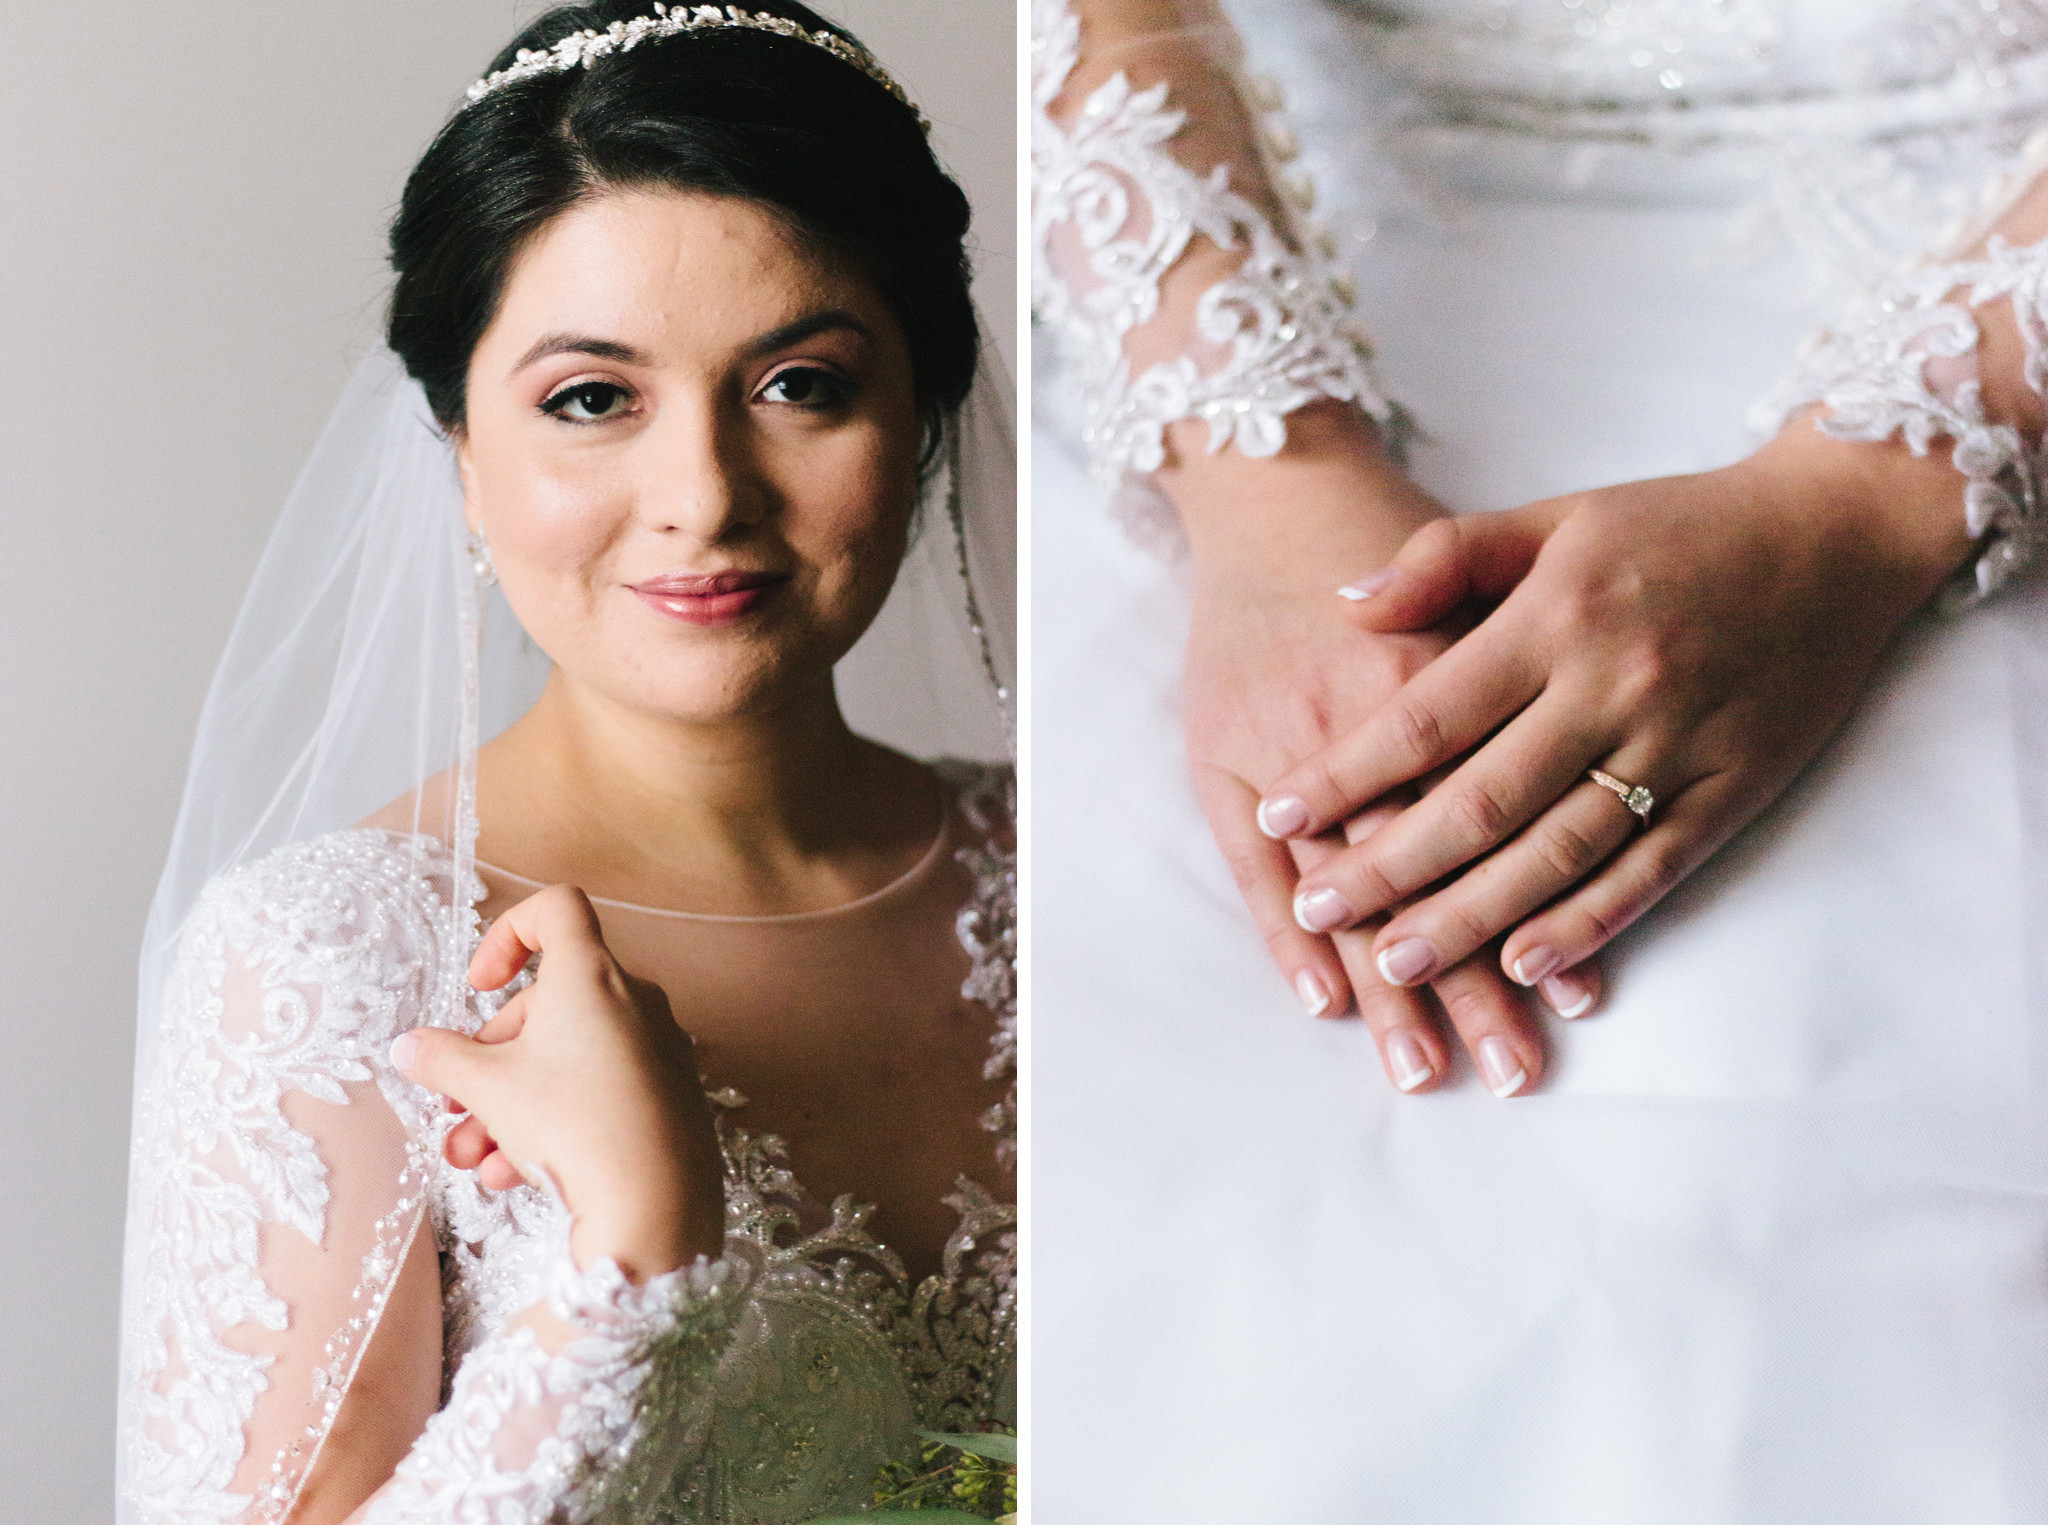 006-rempel-photography-chicago-wedding-inspiration-susan-daniel-michigan-metro-detroit-christian-church-holly-vault-cupcakes-and-kisses.jpg